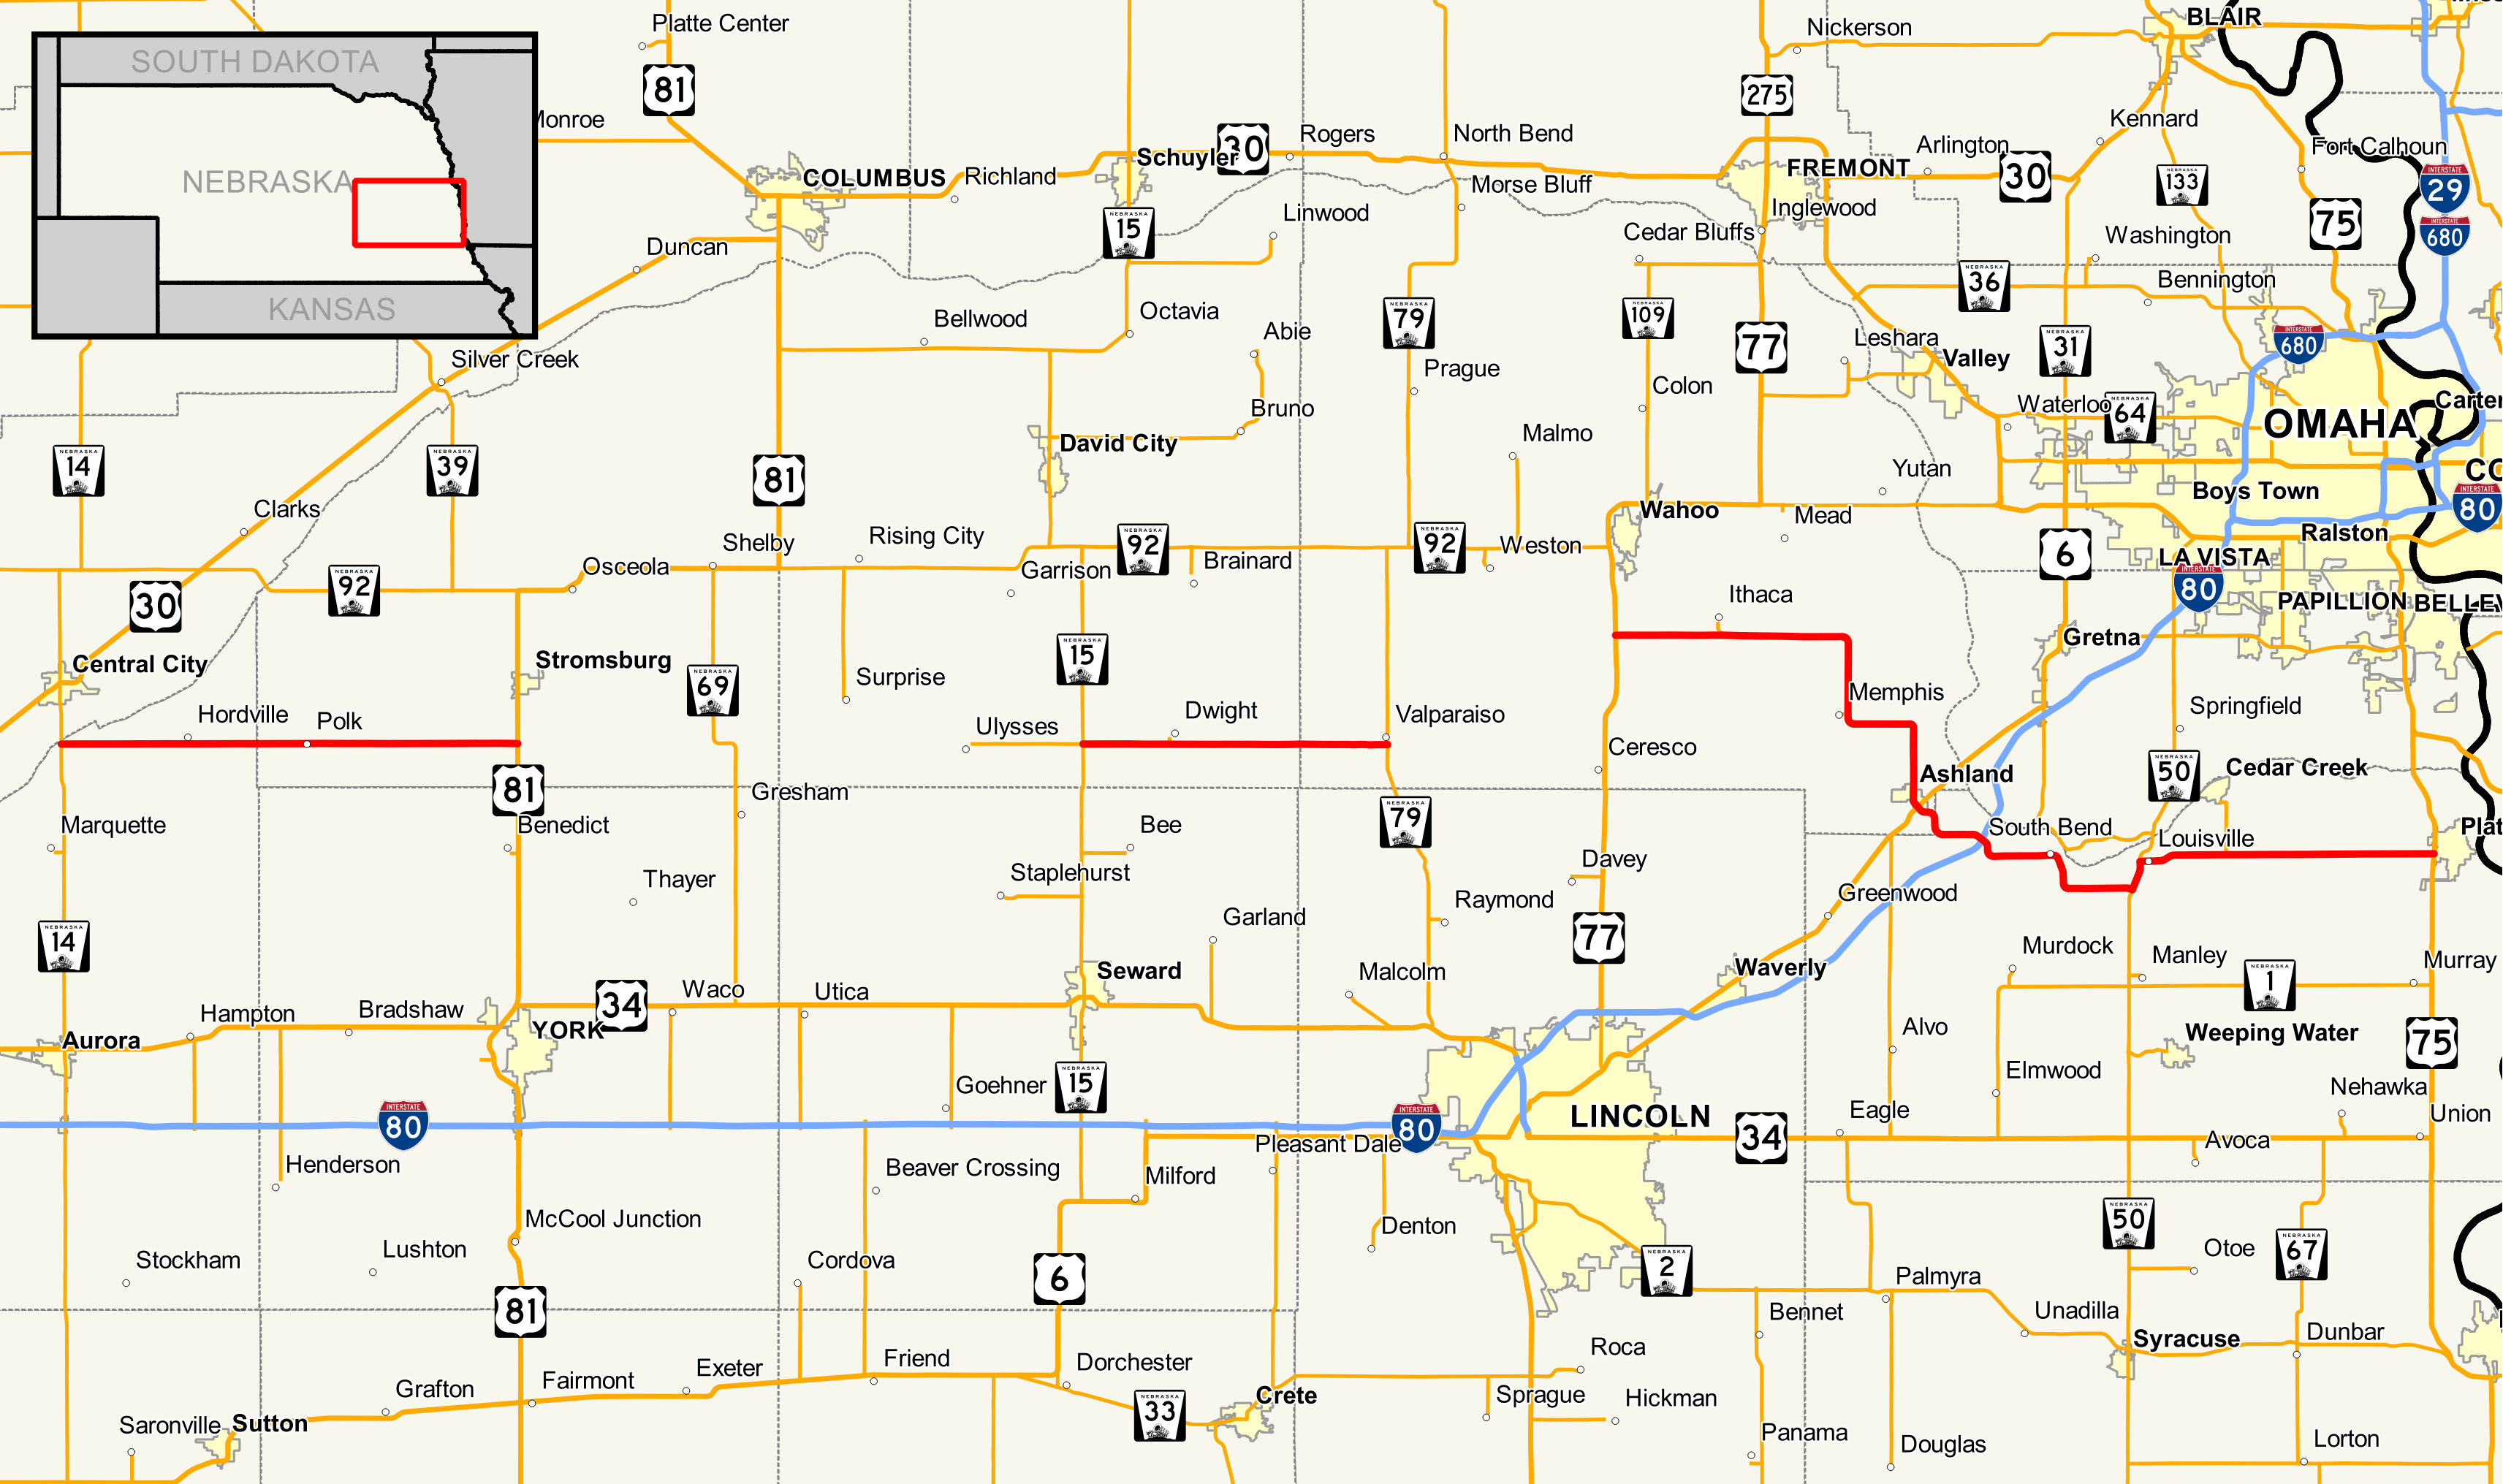 nebraska highway 66 - wikipedia